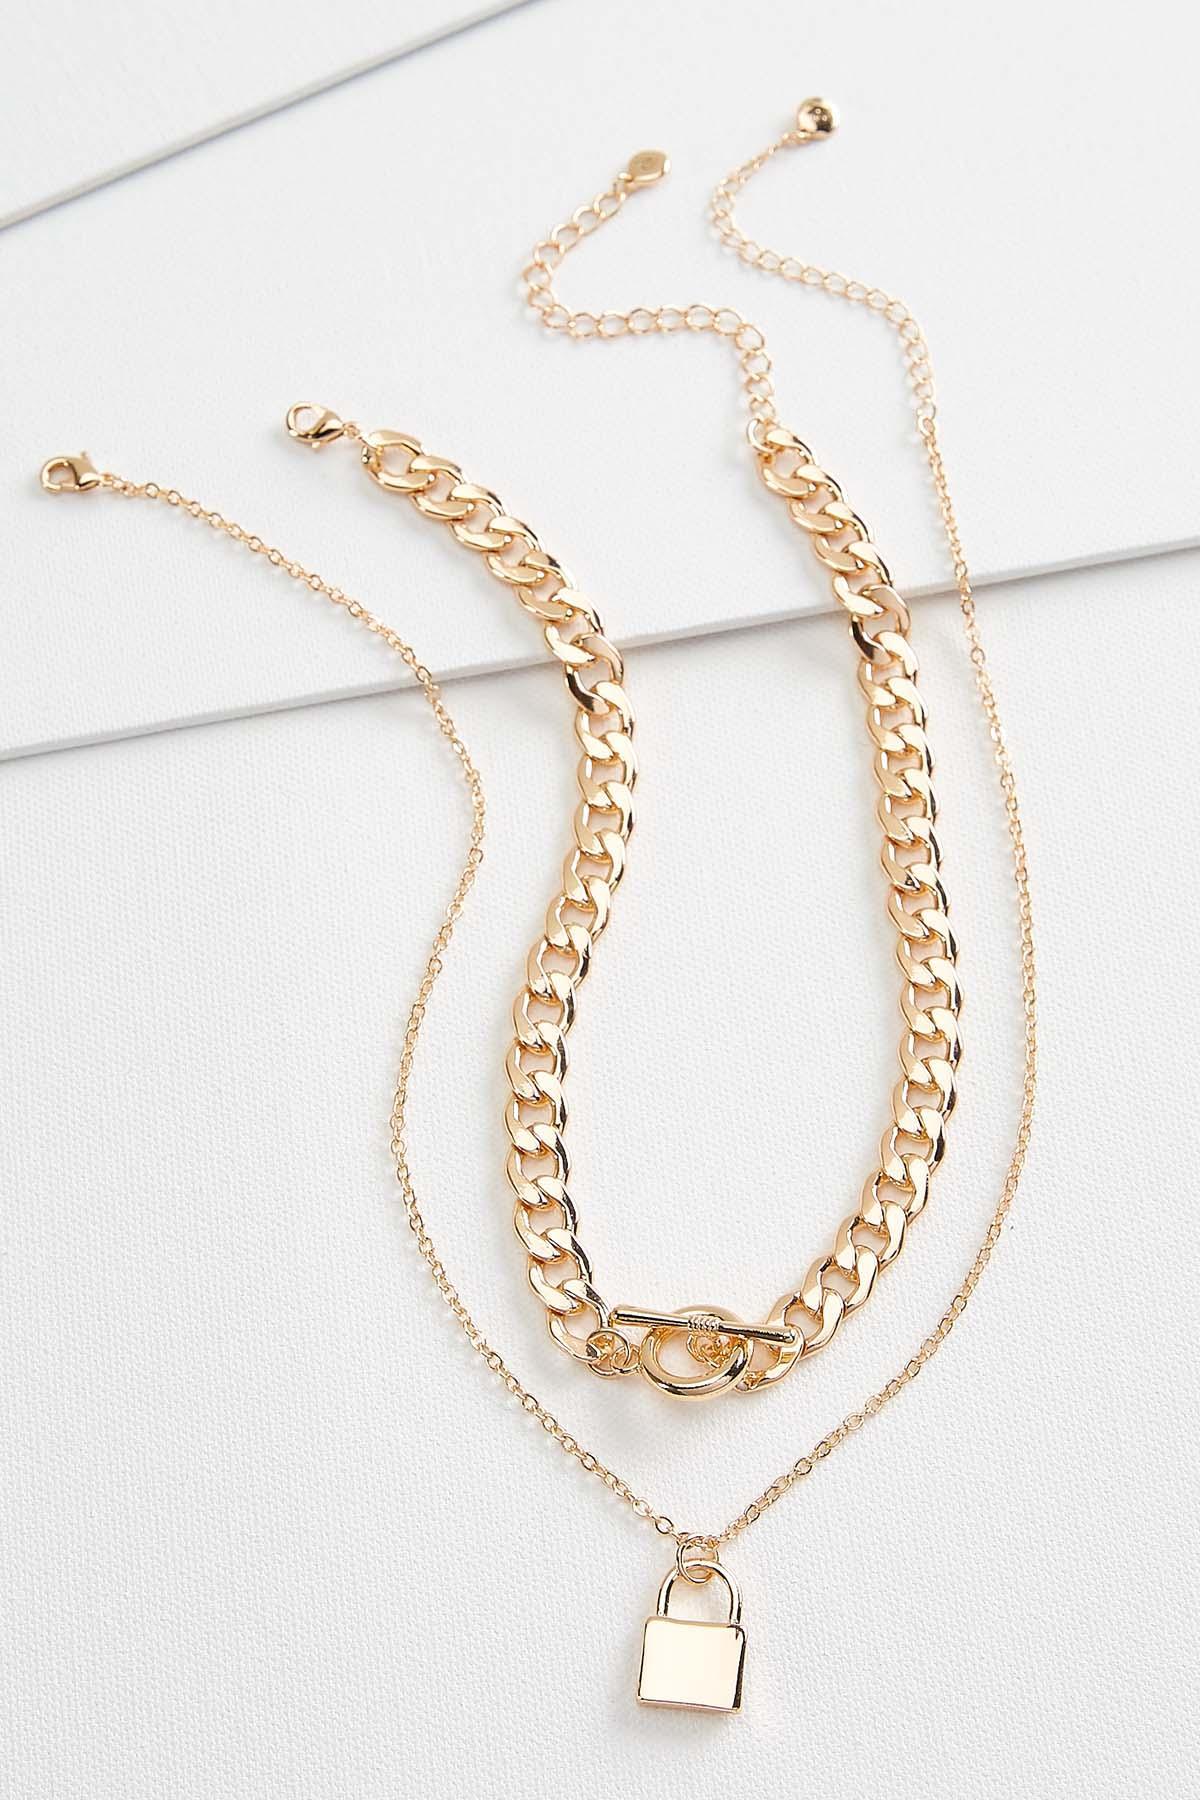 Chain Link Locket Necklace